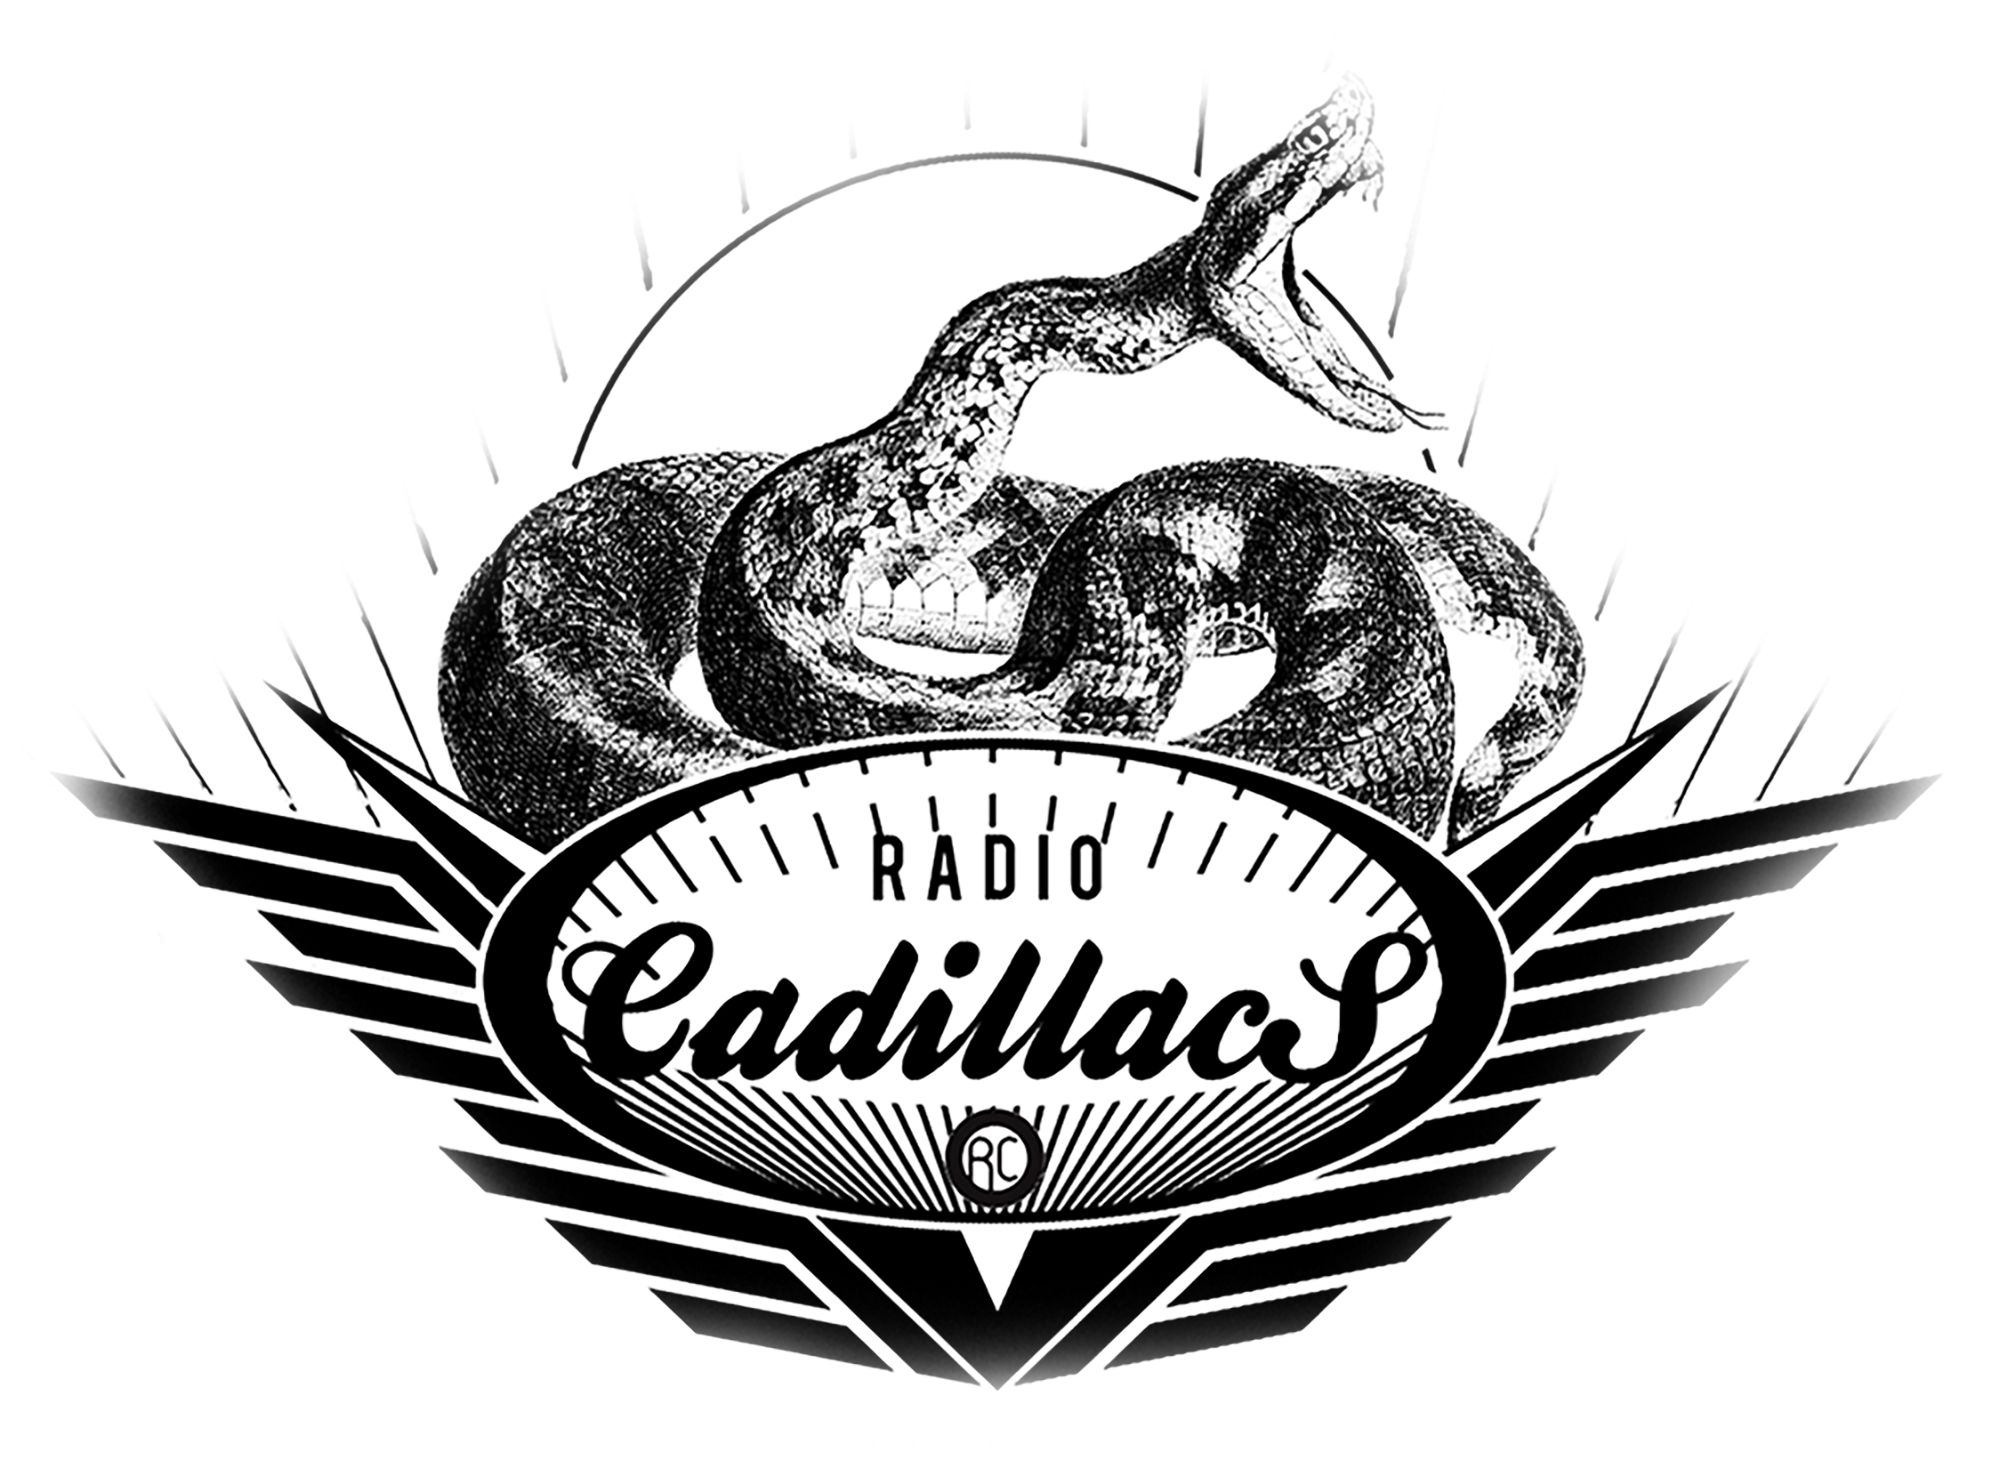 ADESIVO-RCADILACSS-Recovered.jpg